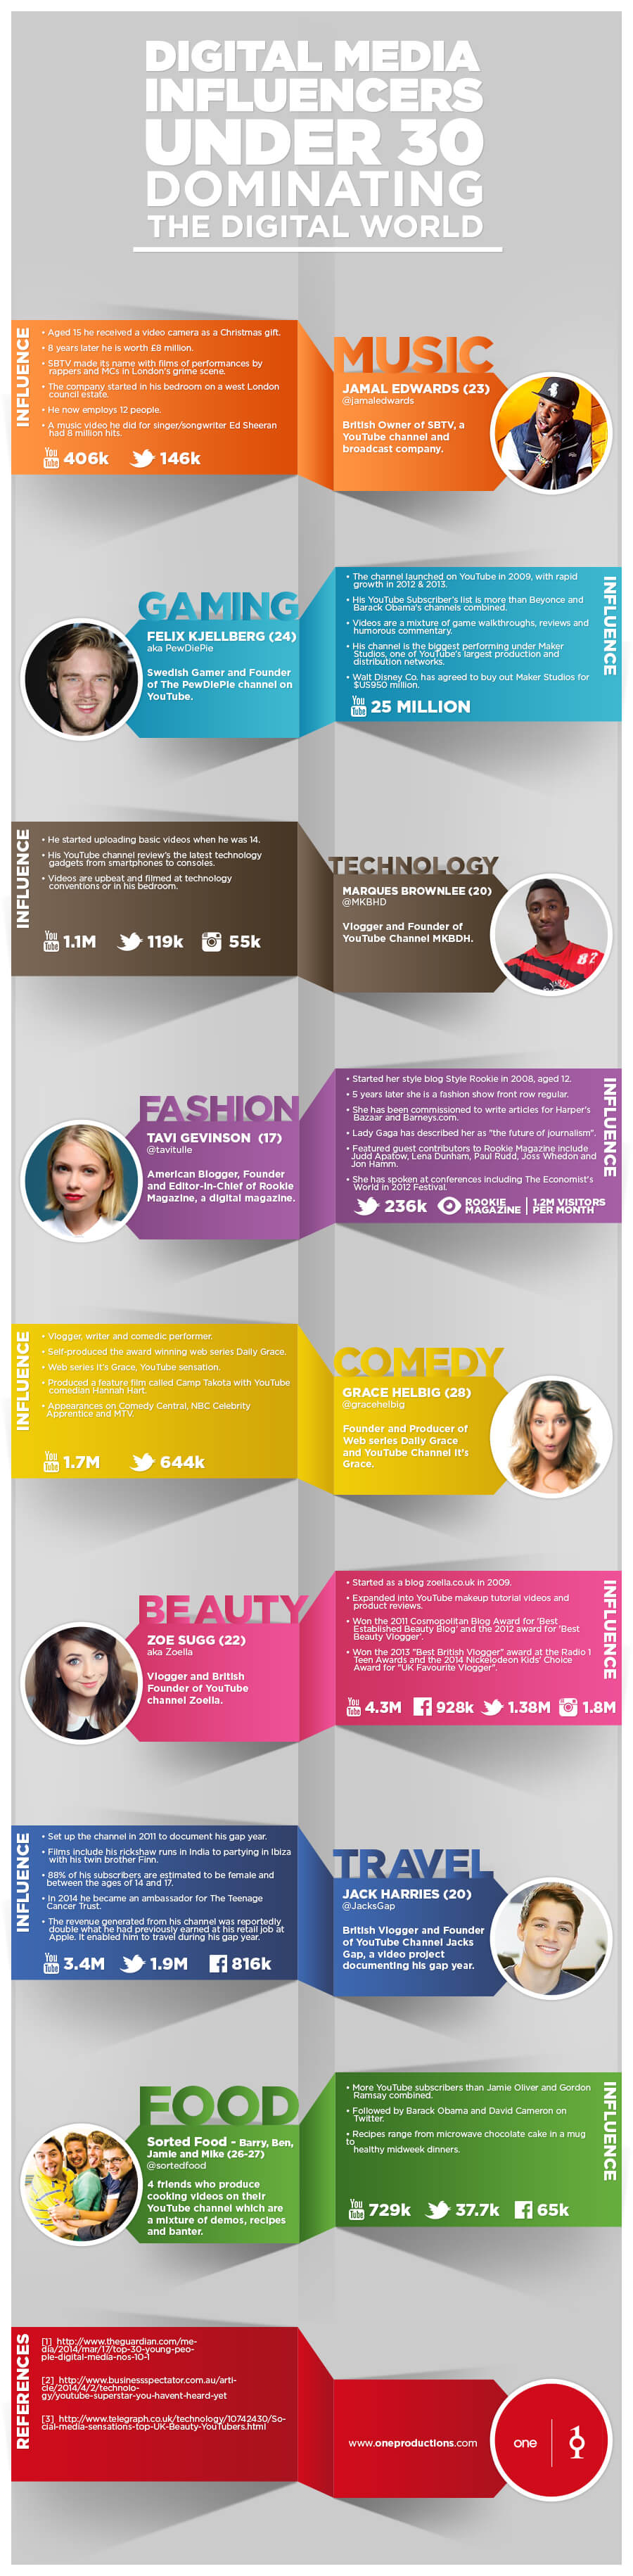 digital-media-influencers-infographic